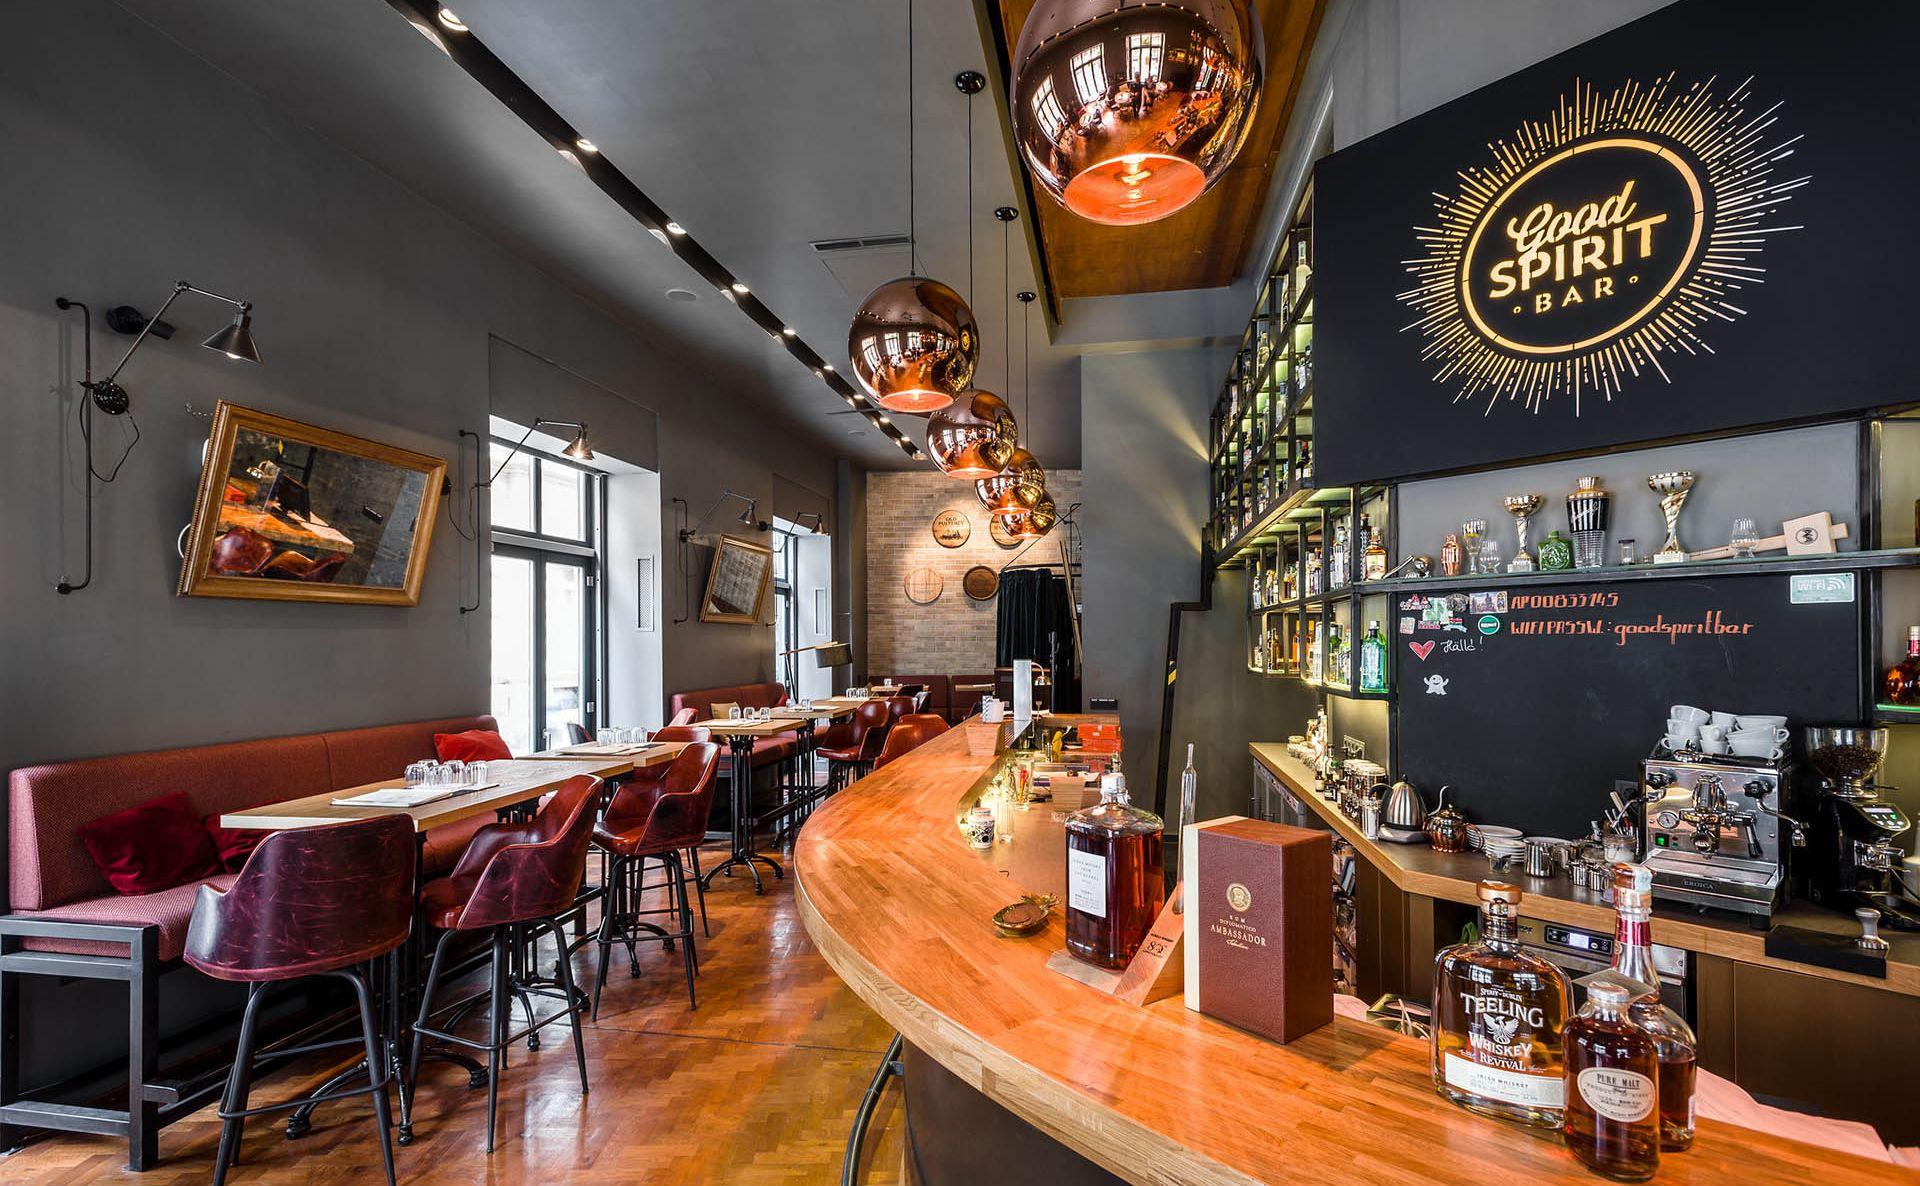 Good Spirit Bar Budapest גוד ספיריט בר בבודפשט וויסקי